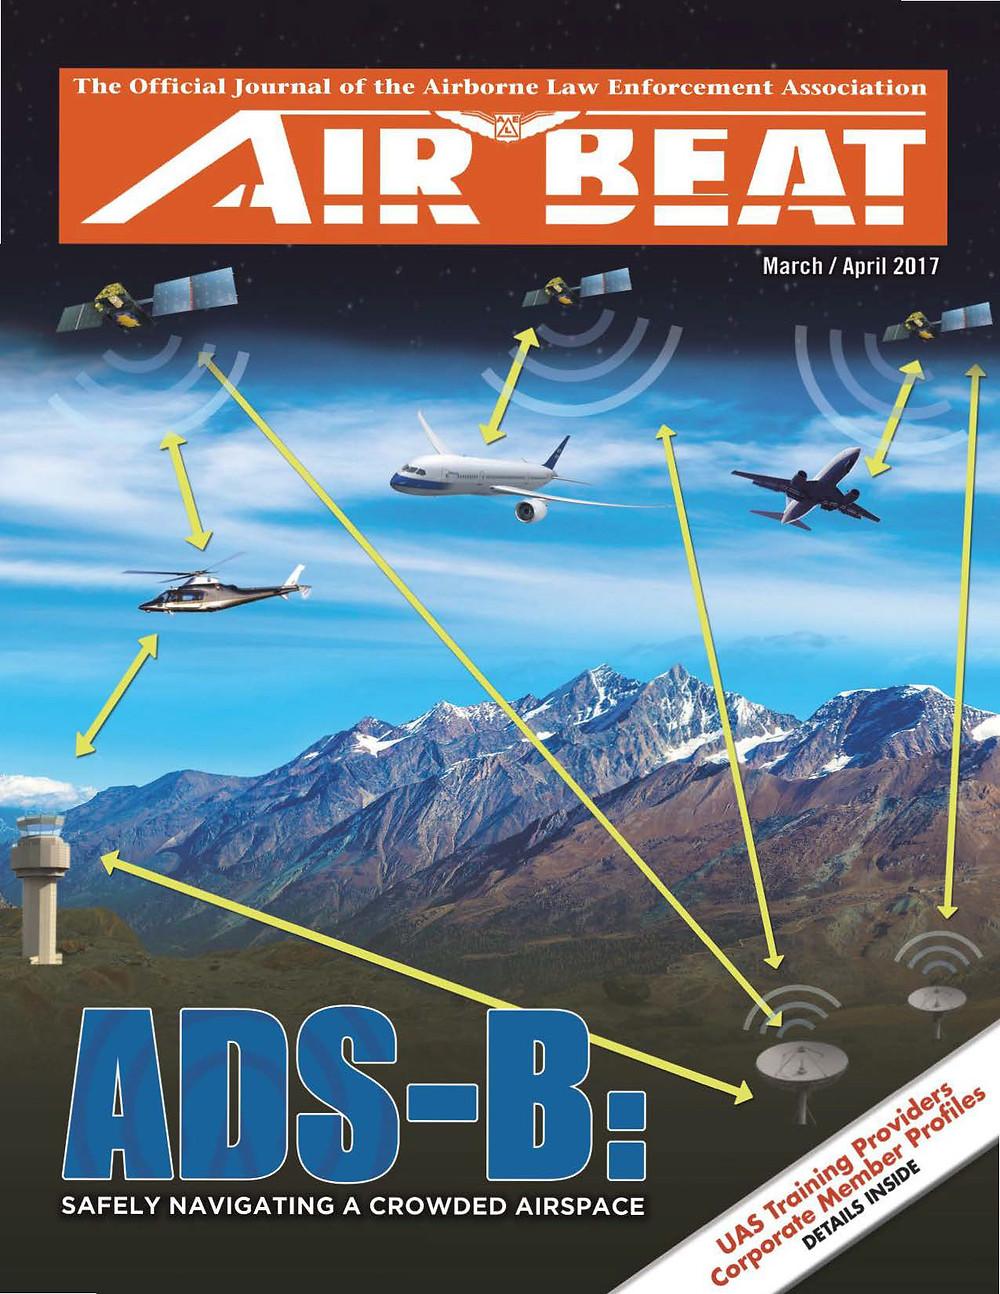 AIR BEAT Magazine Apr/May 2017